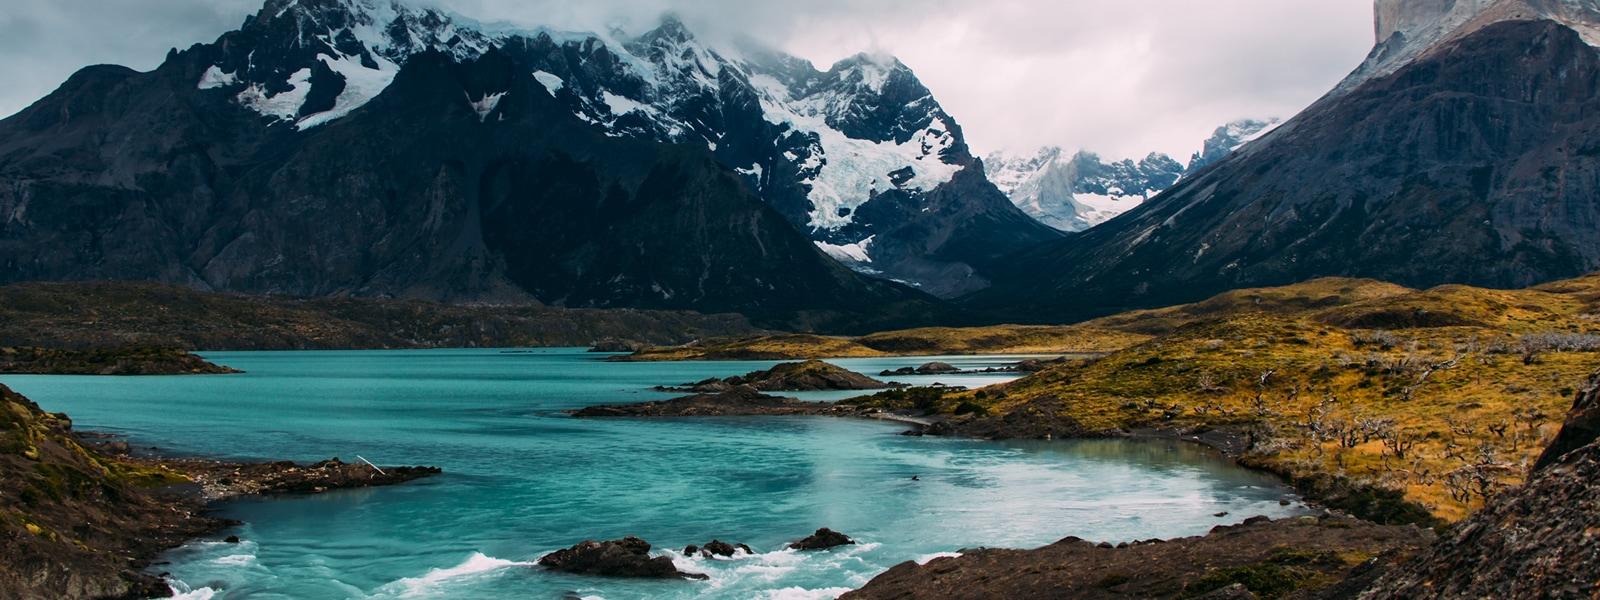 Image of a proglacial river running through snowy mountains